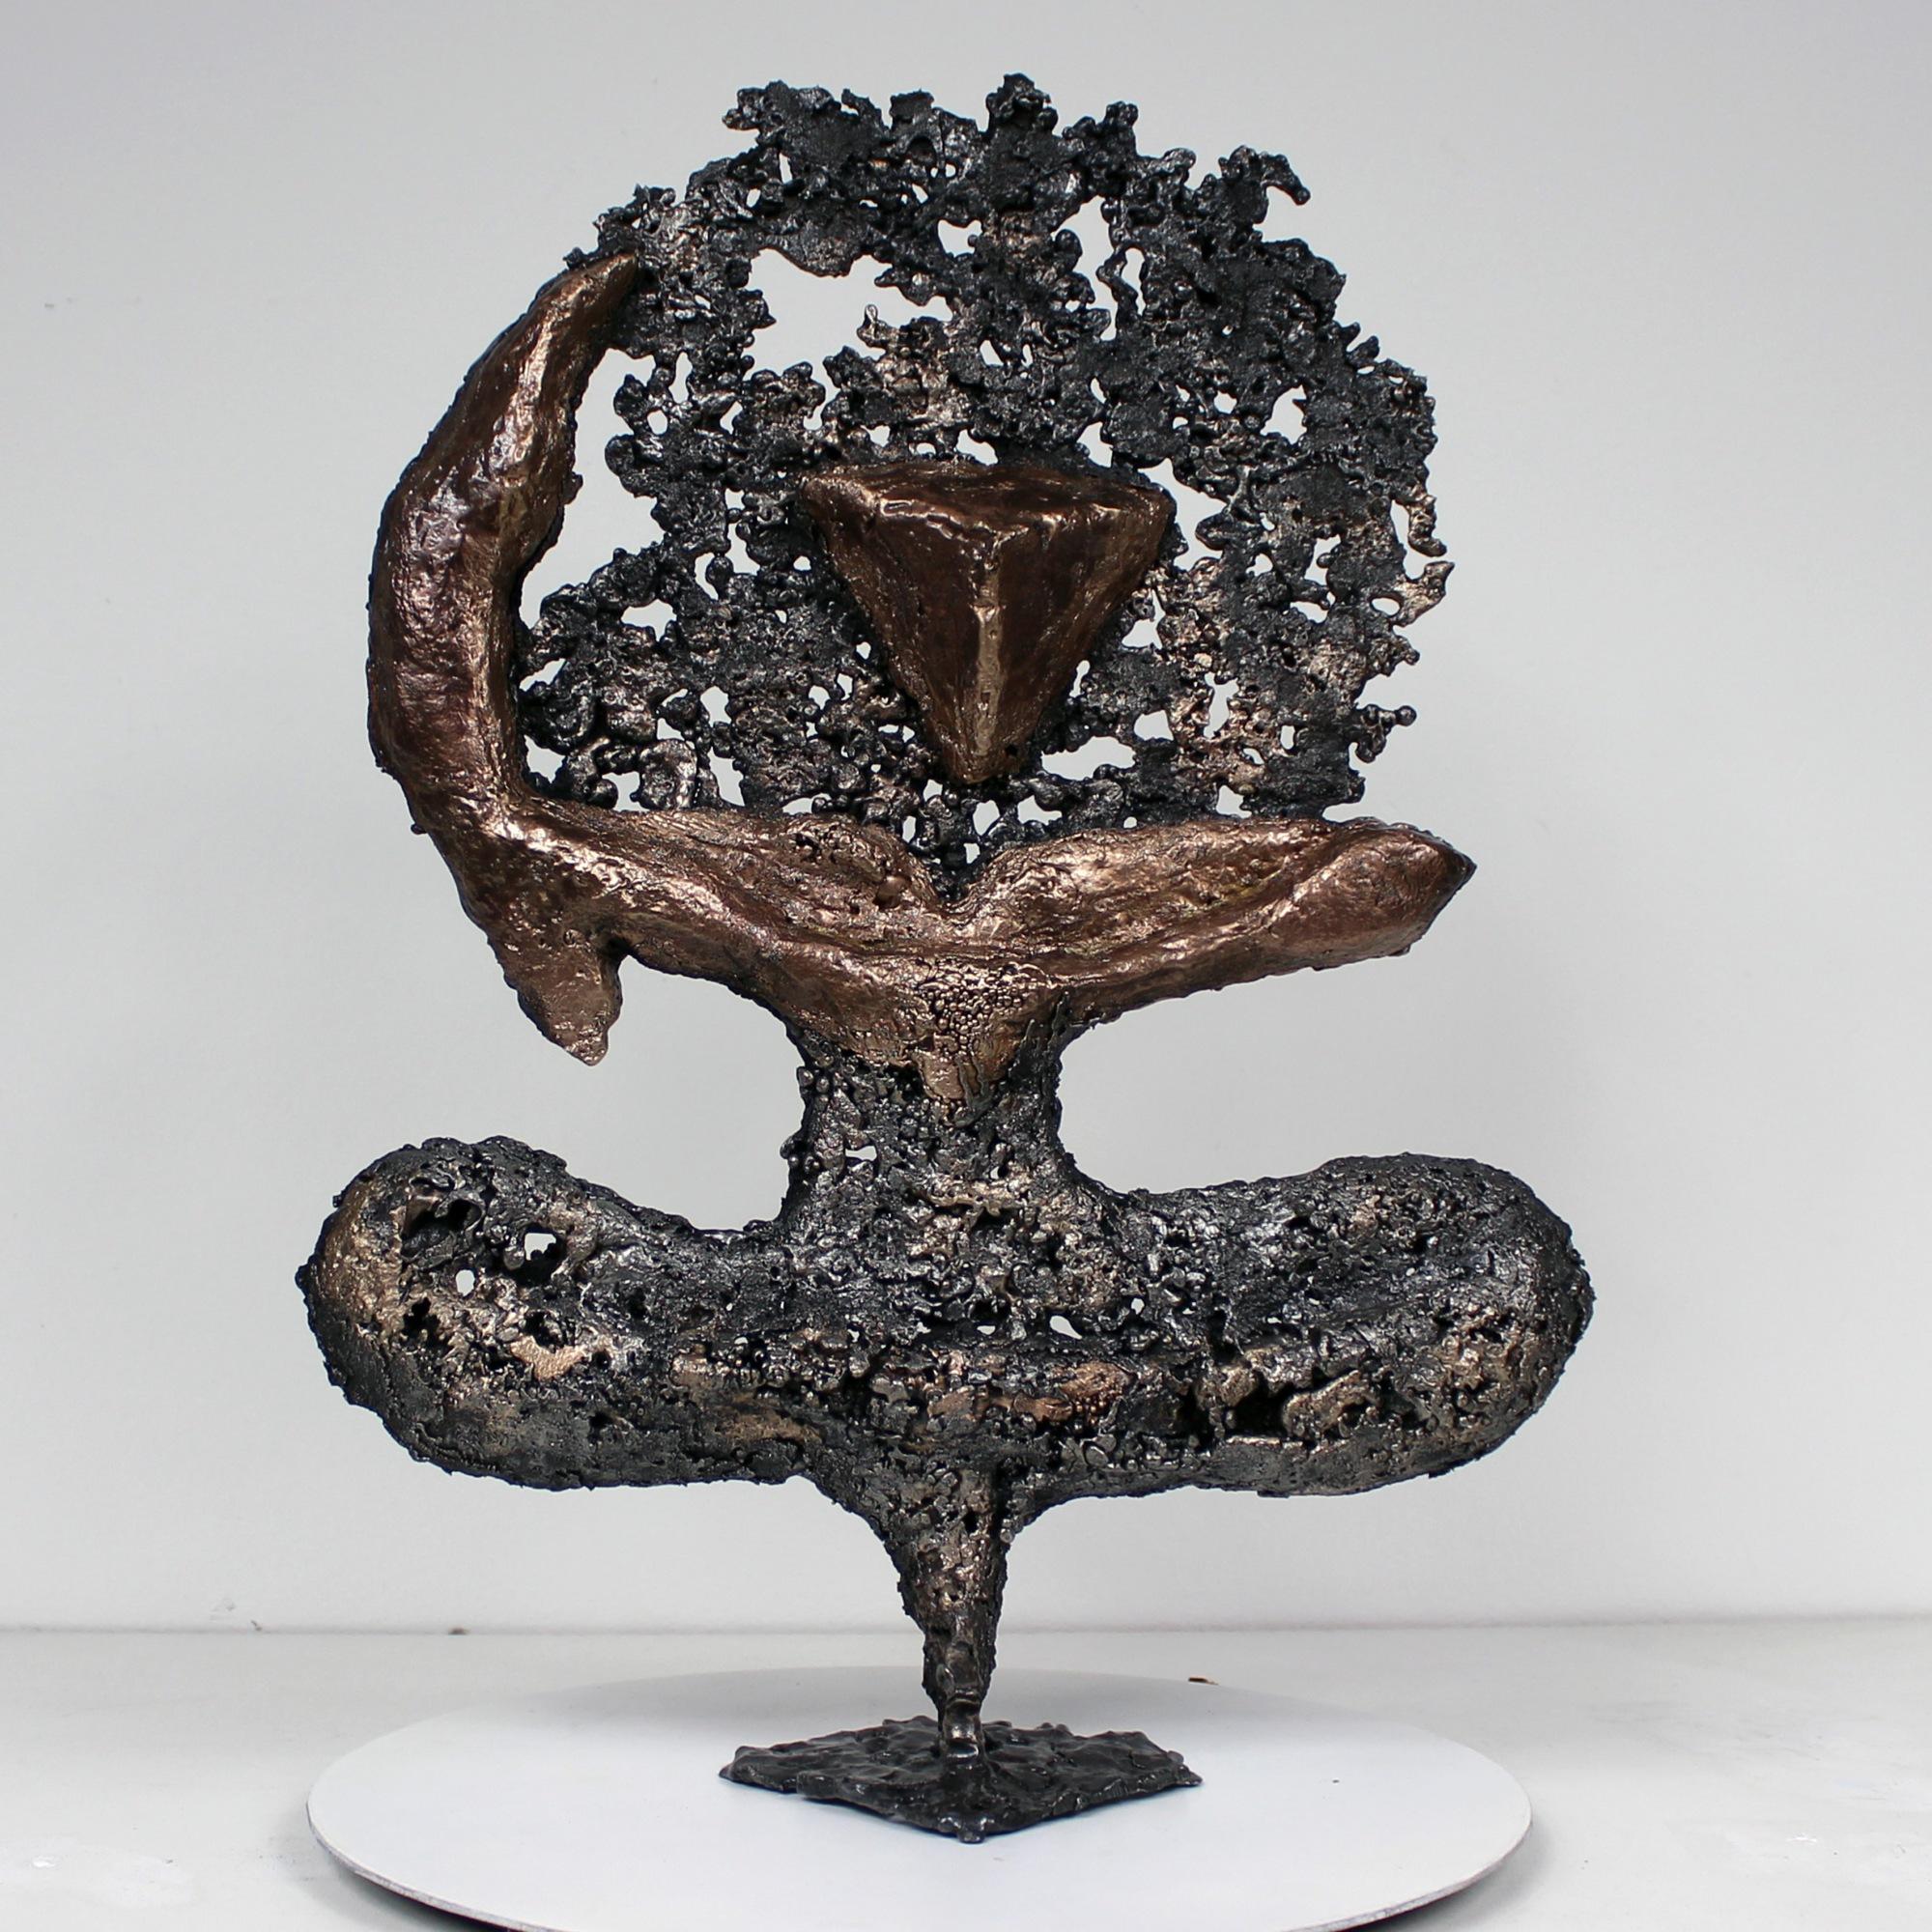 Pavarti calligraphie violette I - Sculpture Metal Buil